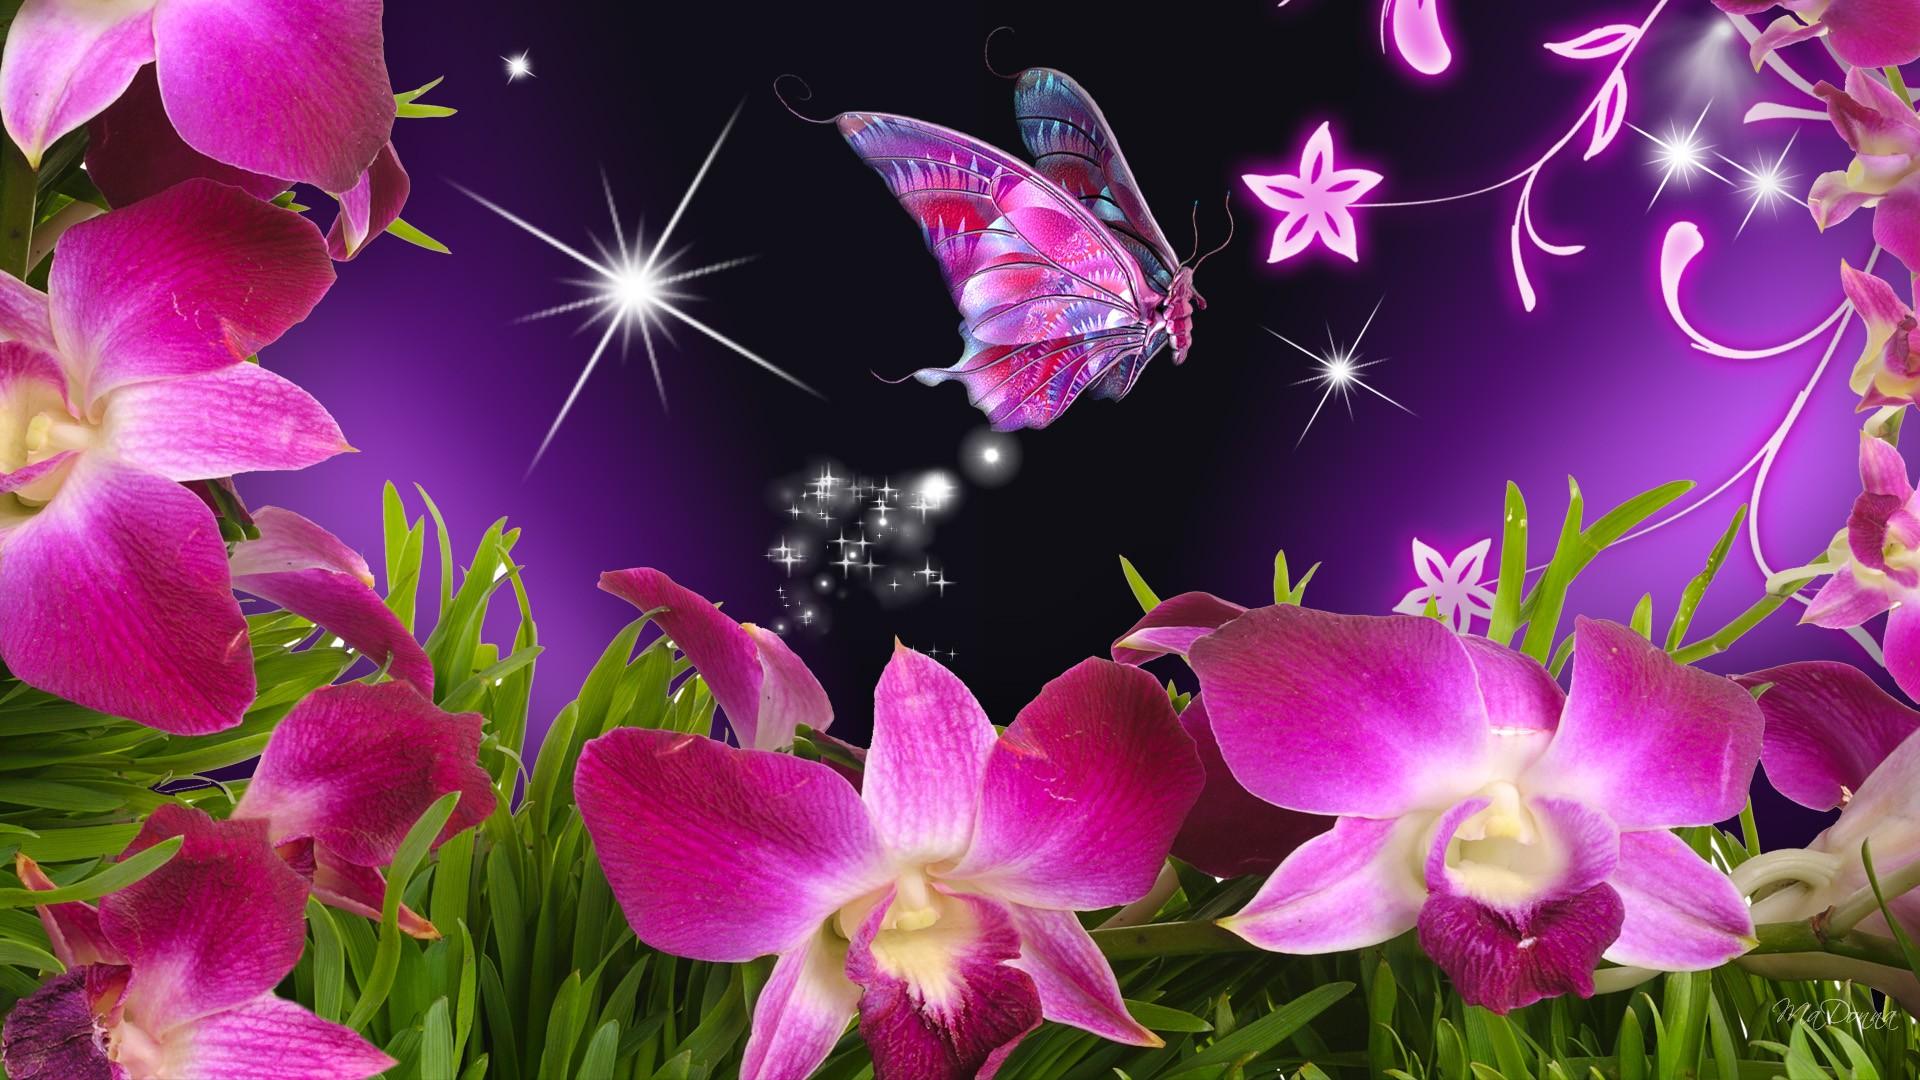 Butterfly and flower wallpaper sf wallpaper butterflies and flowers butterfly flowers orchid purple stars izmirmasajfo